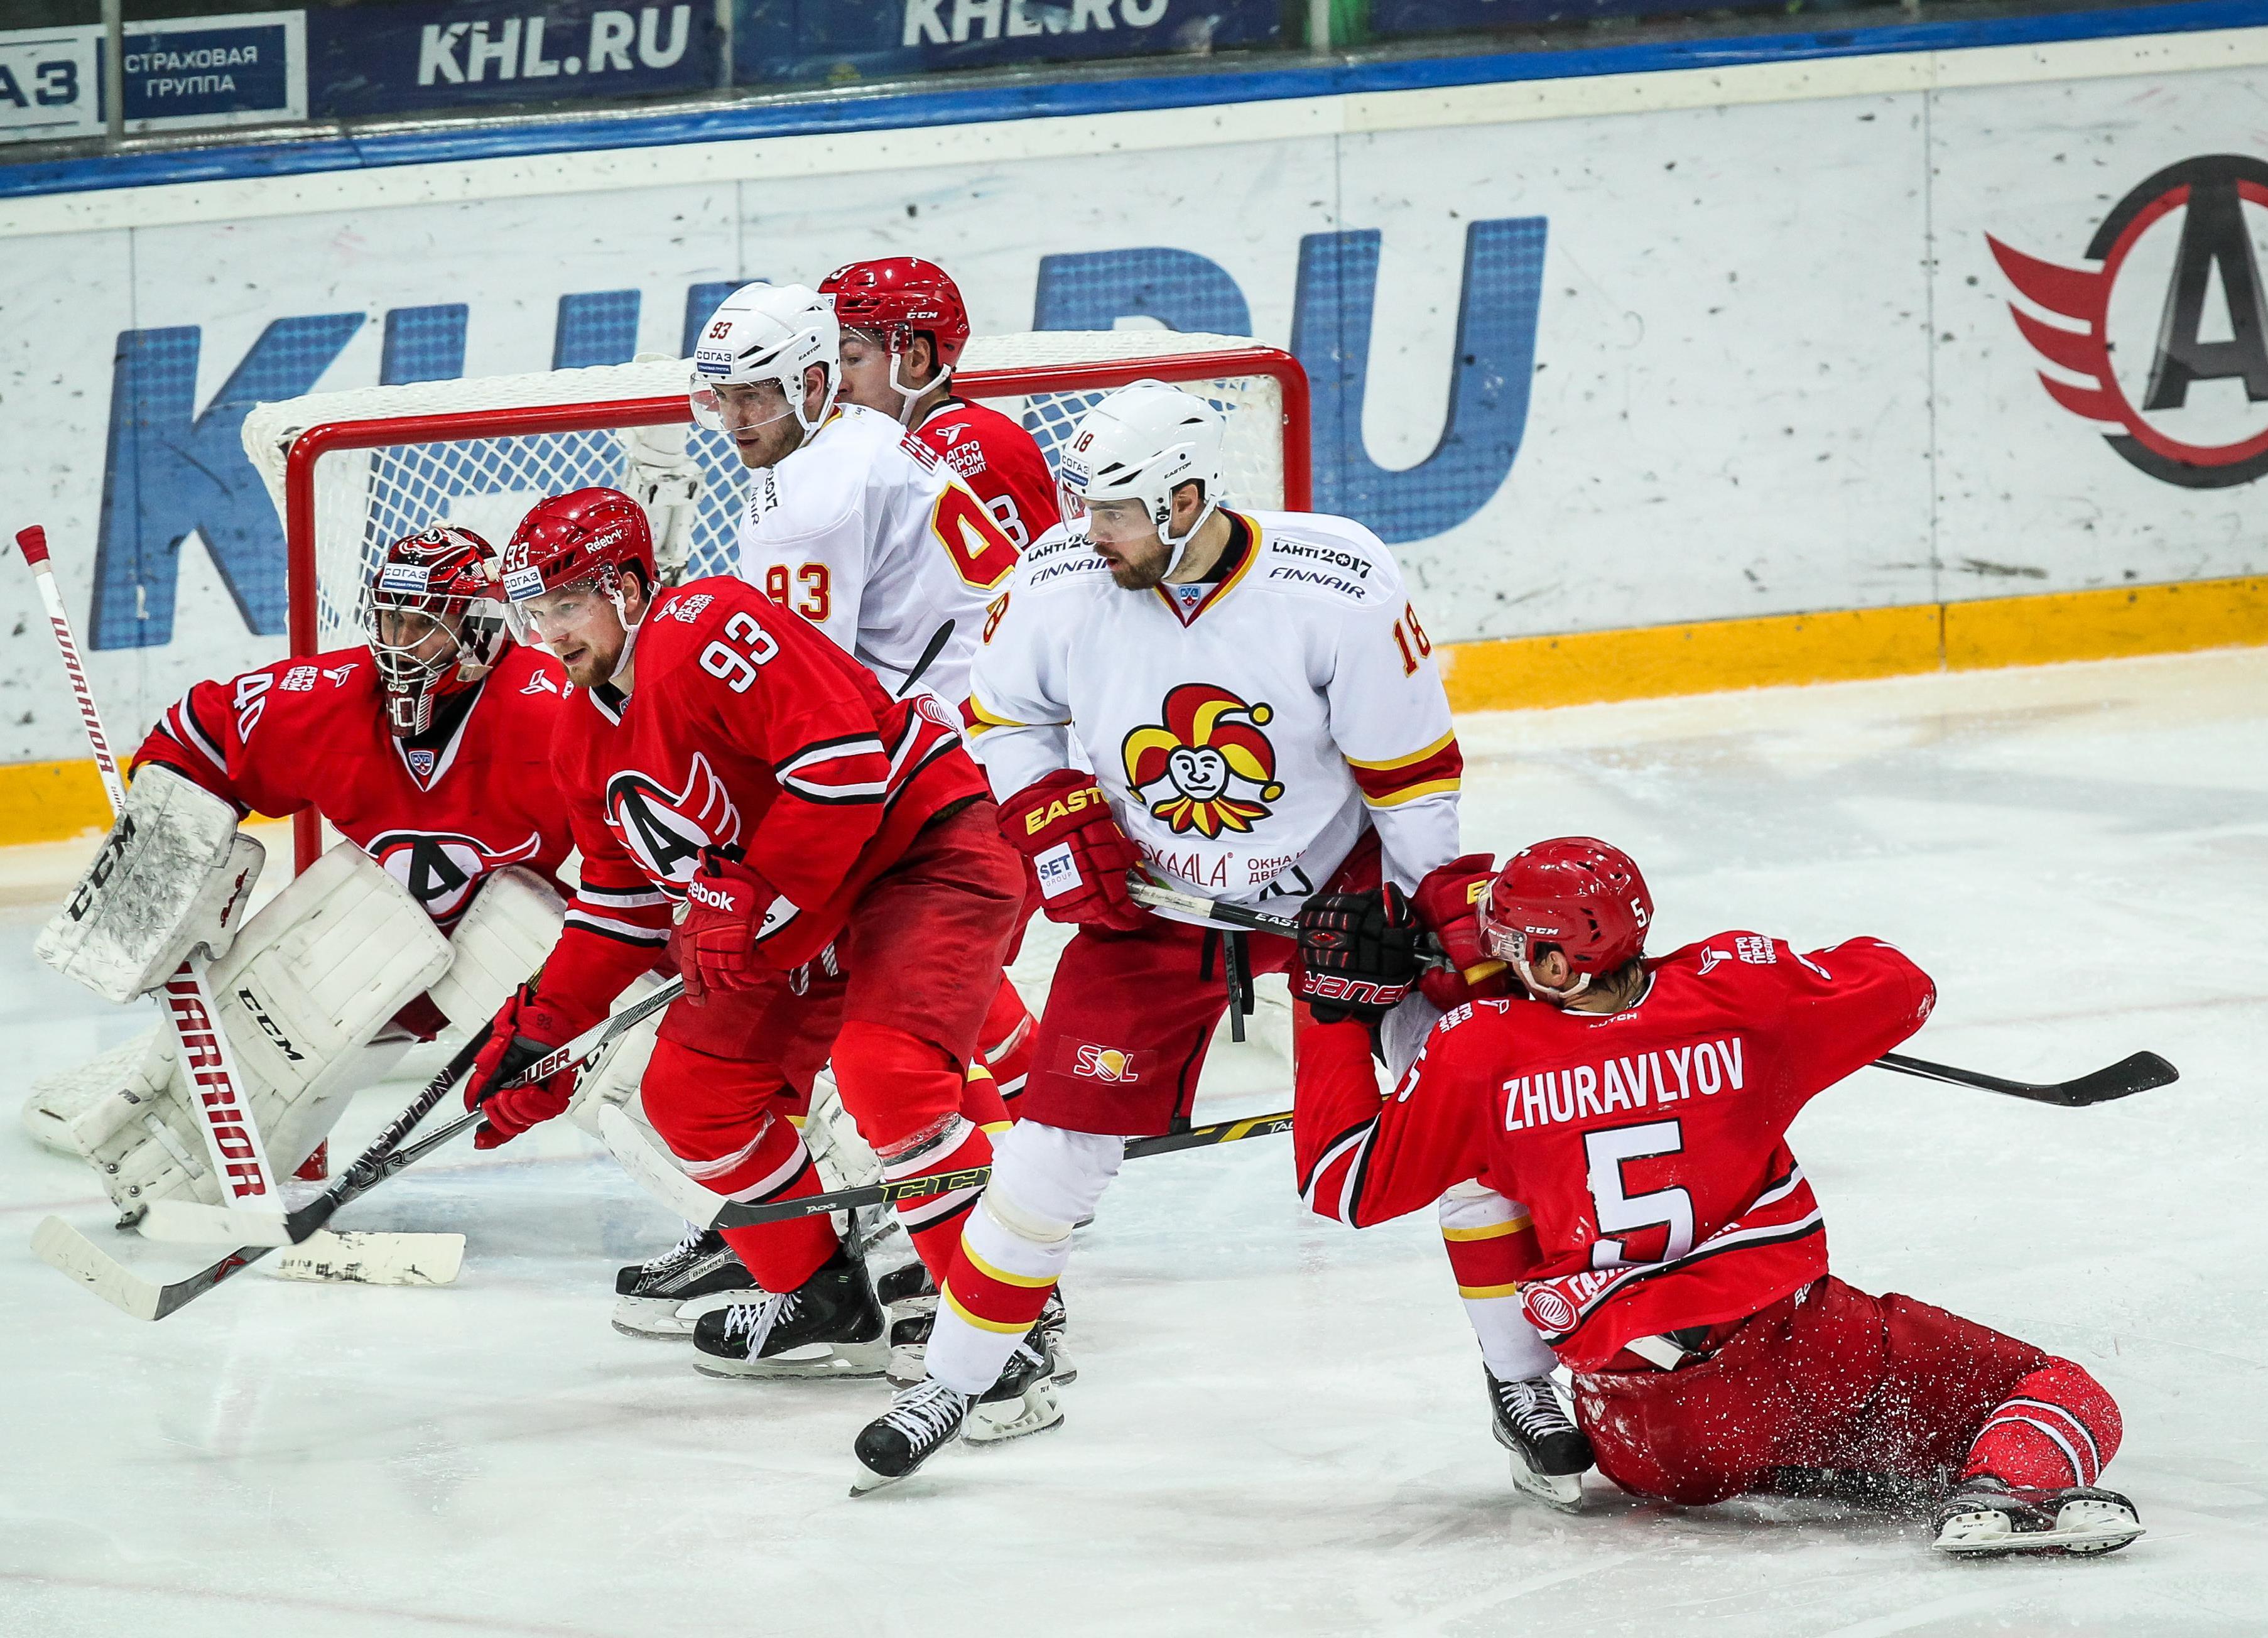 KHL: Jokerit Helsinki stoppt wegen Coronavirus – Sven Andrighetto mit Saisonende